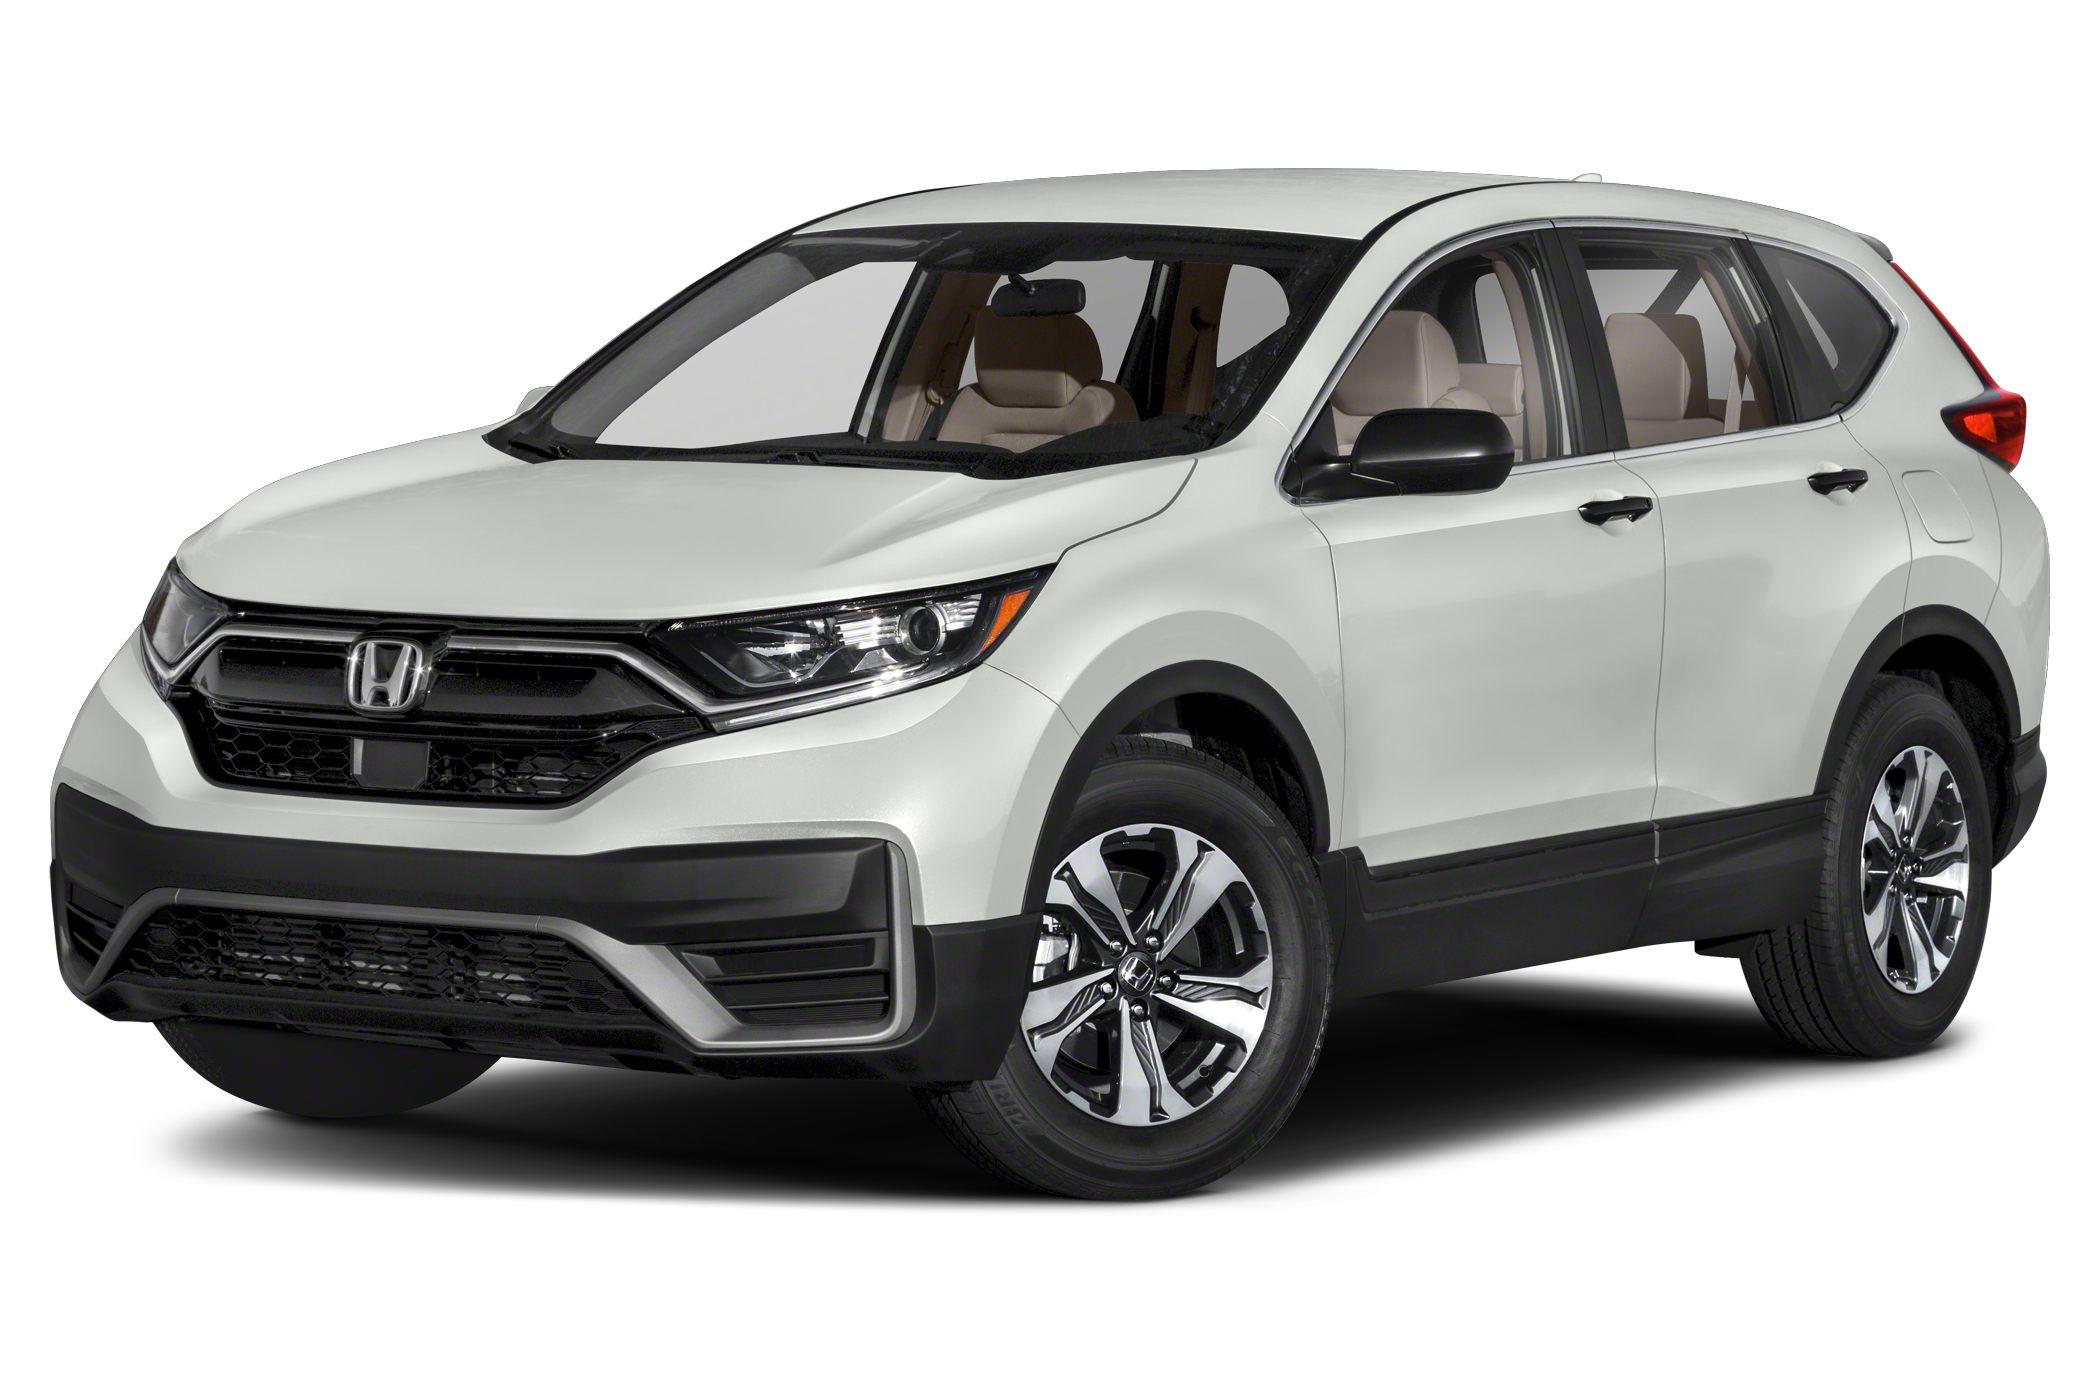 2020 Honda Cr V Rebates And Incentives